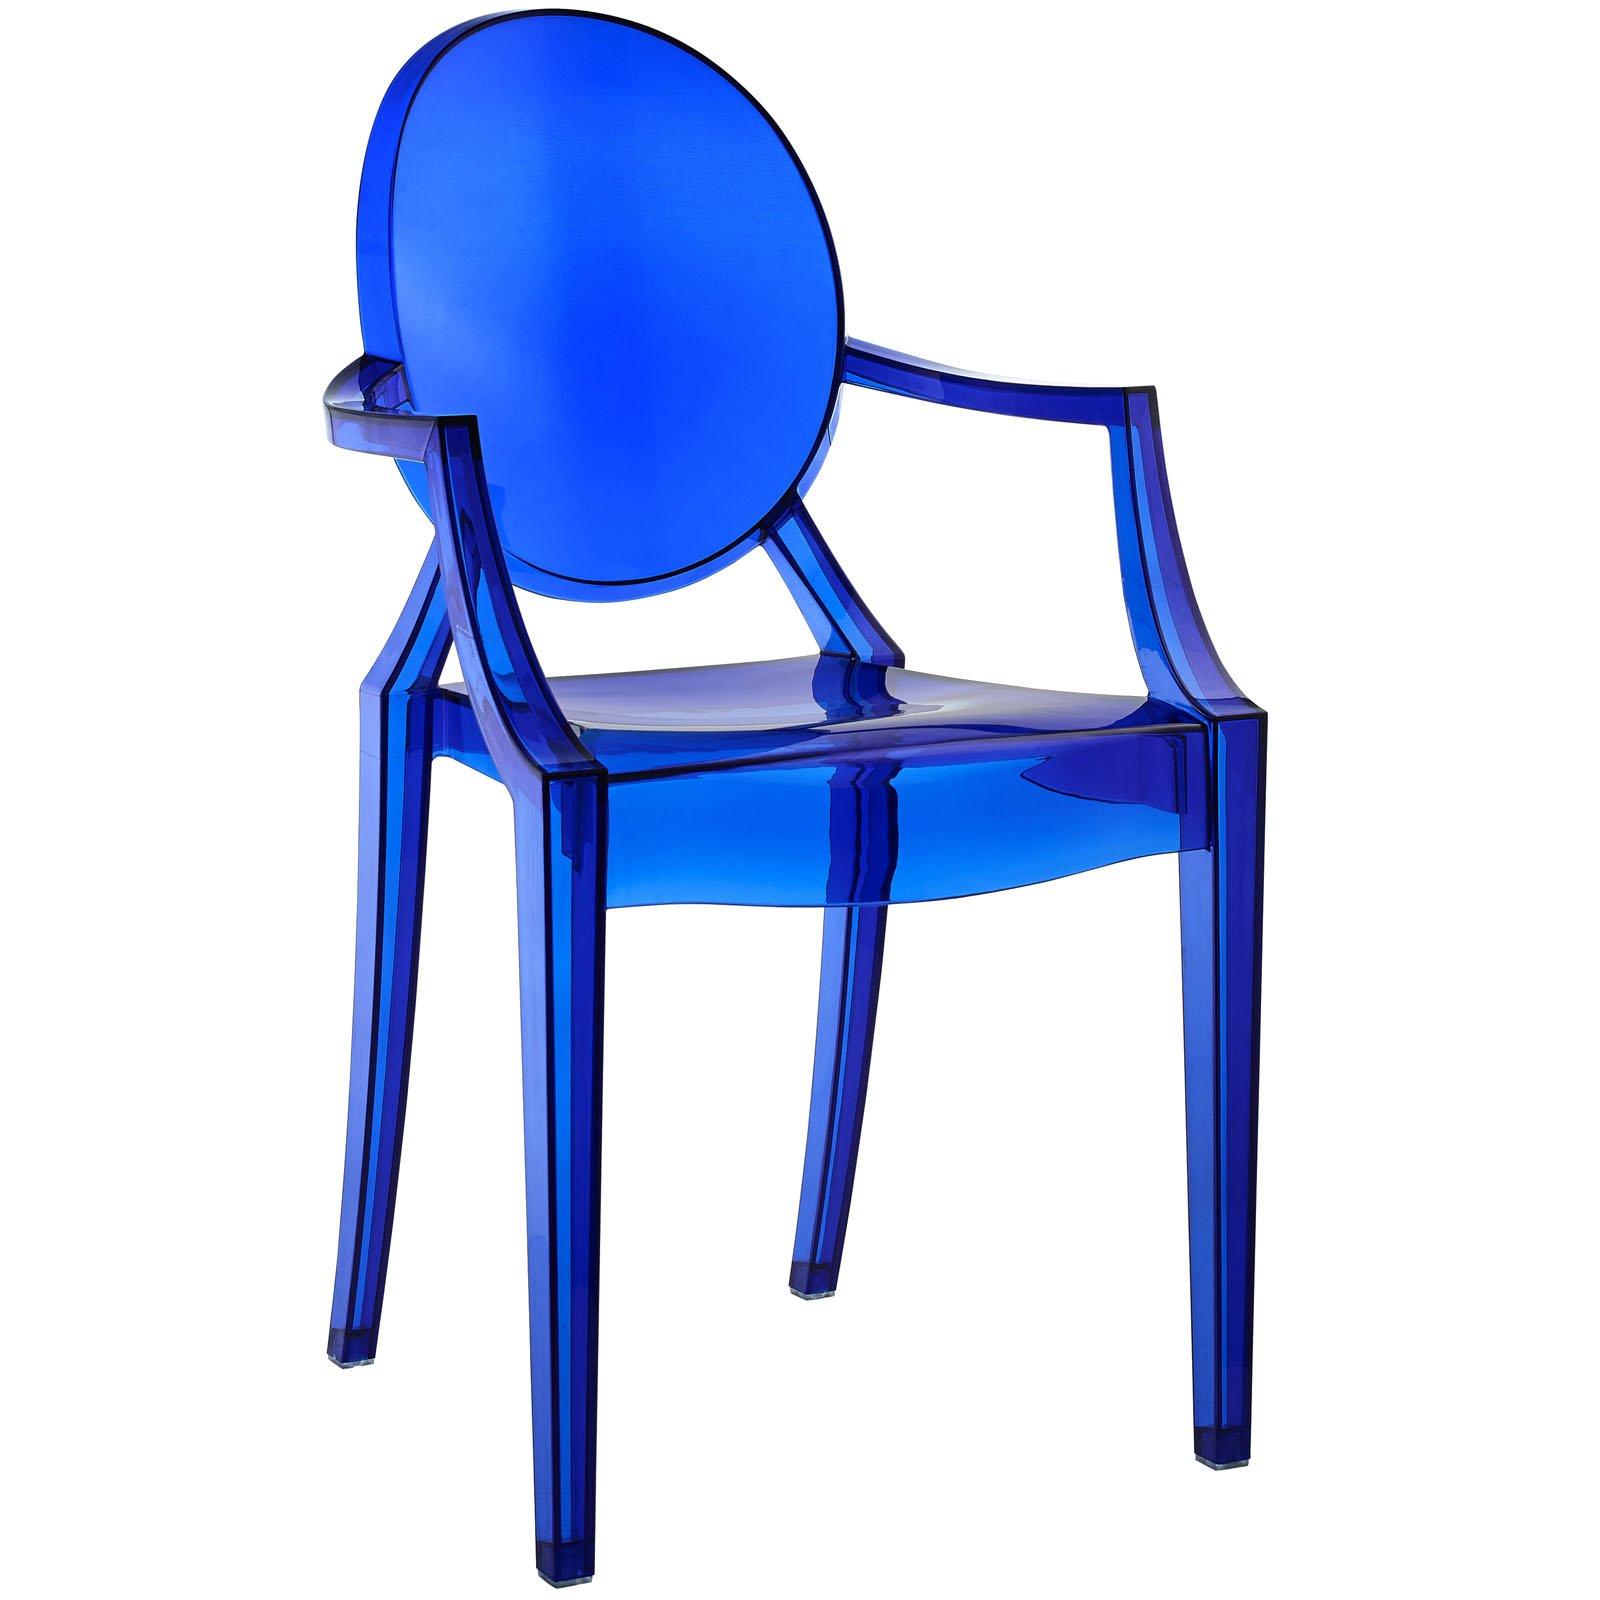 Modway Casper Modern Acrylic Dining Armchair in Blue by Modway